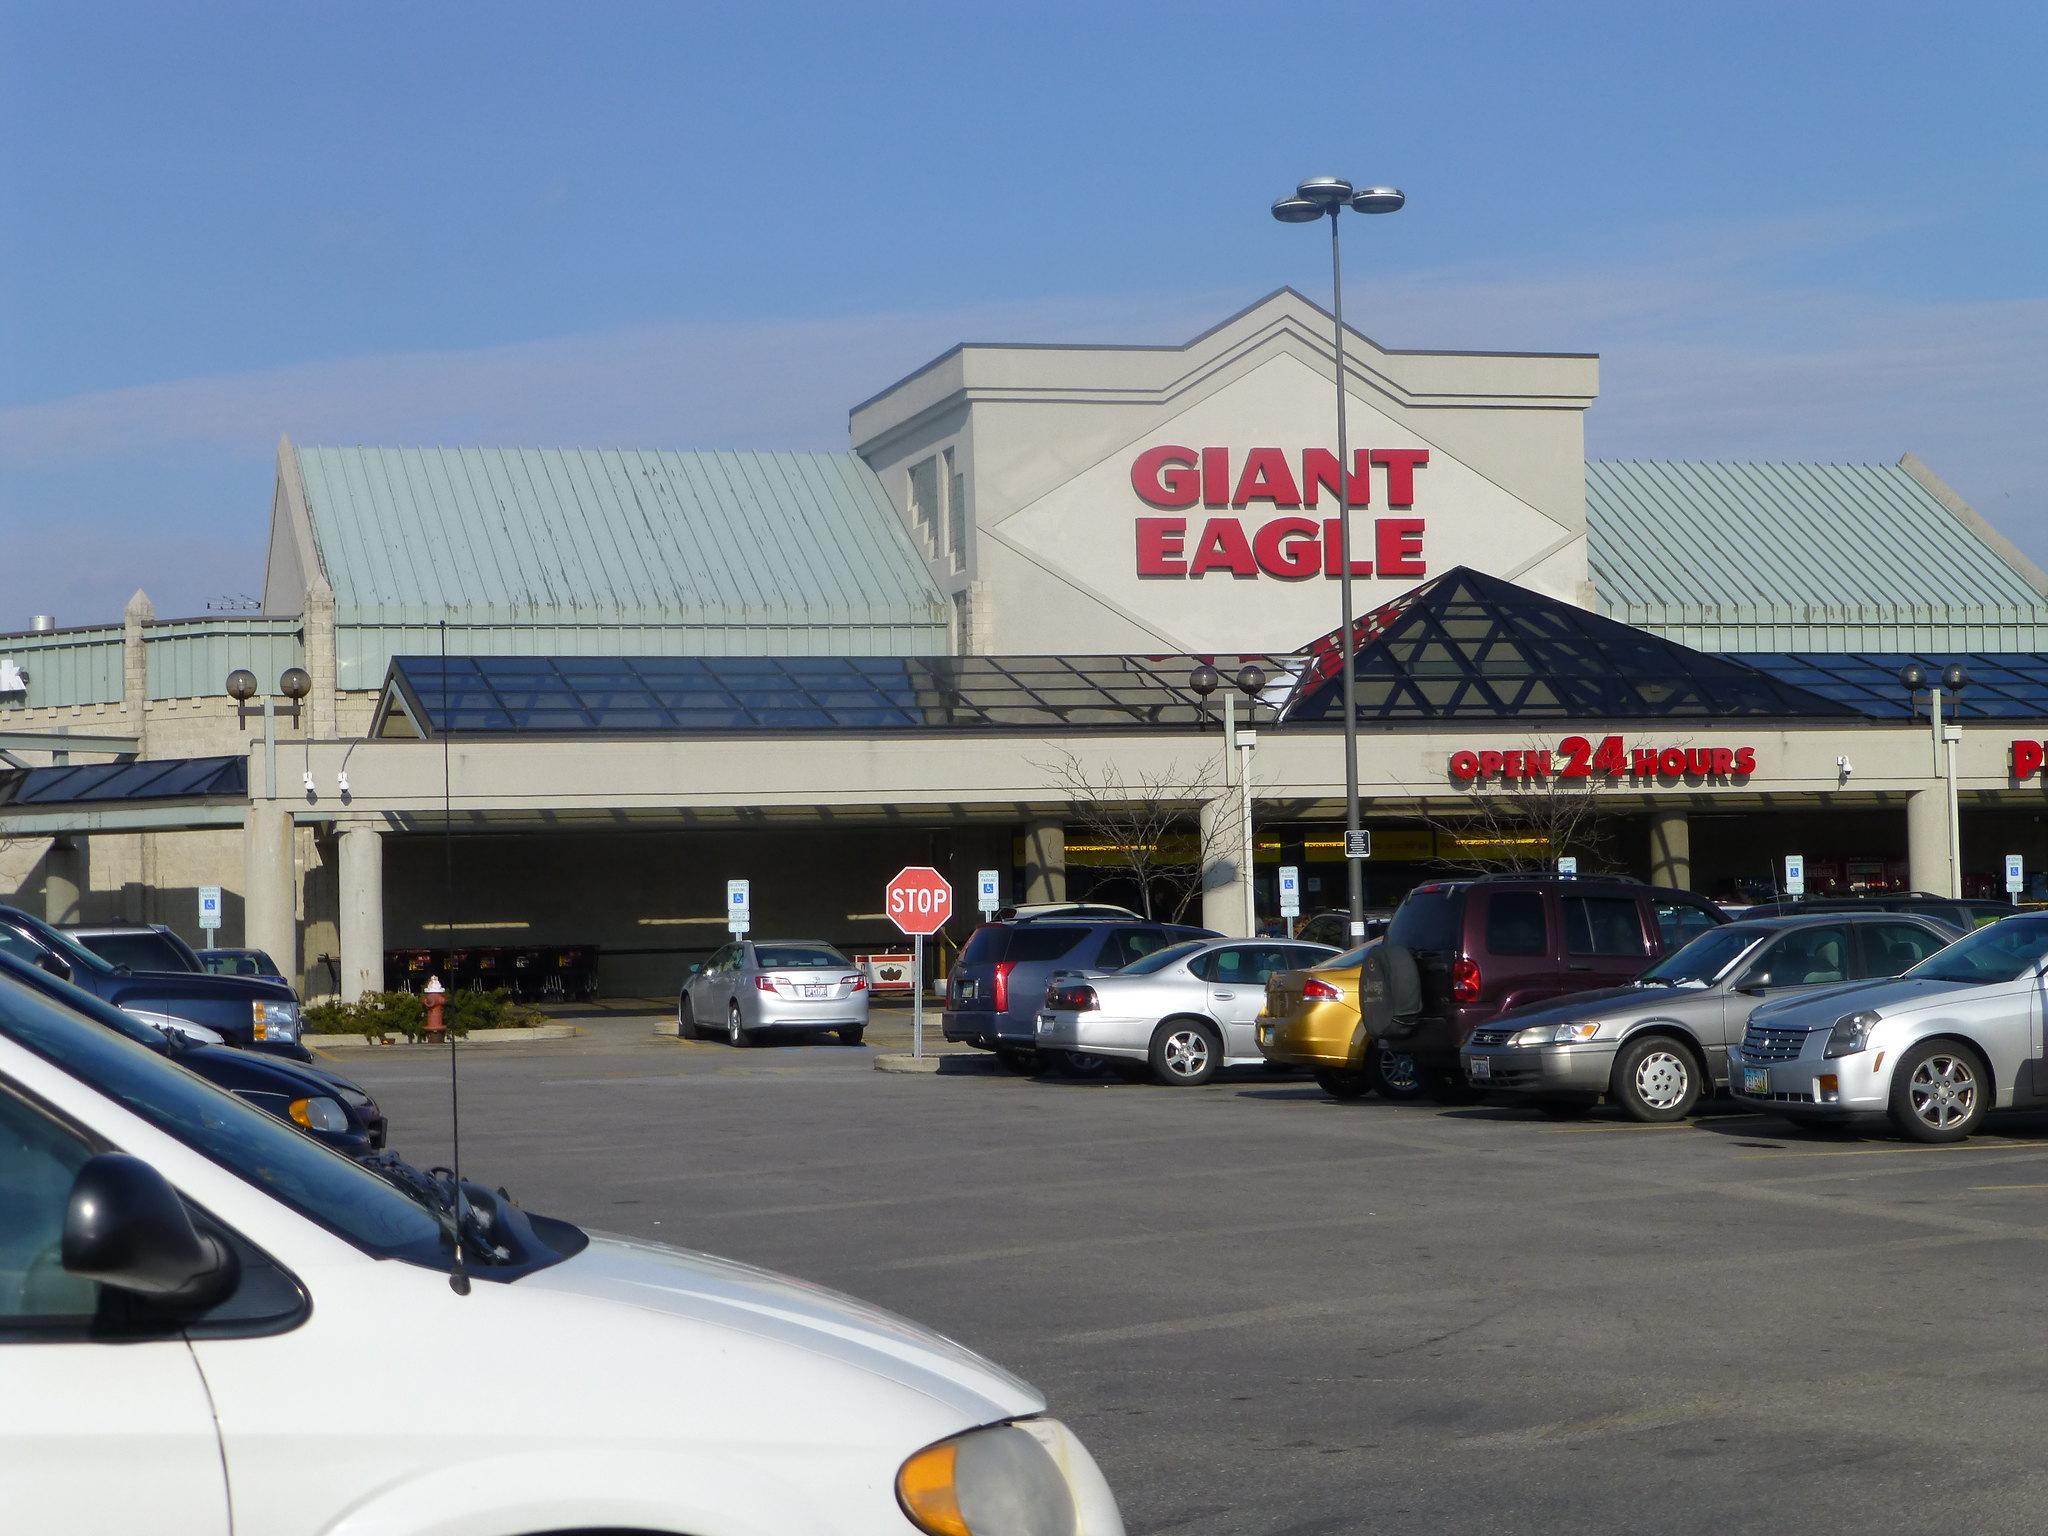 Eagle Wall Decor